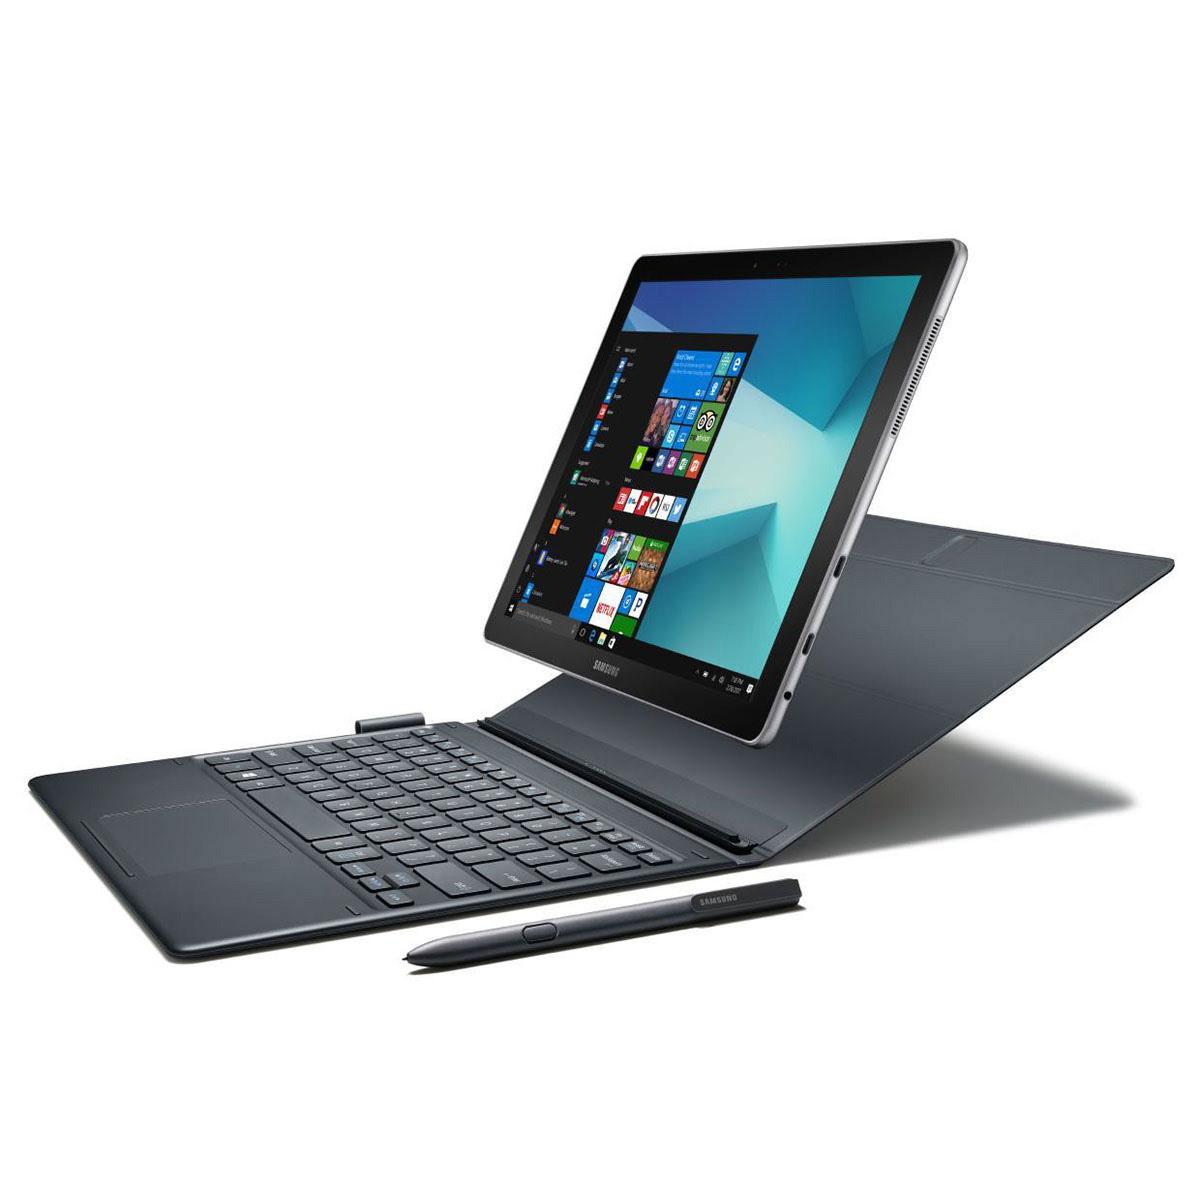 Samsung Galaxy Book W620 - Tablette tactile Samsung - Cybertek.fr - 0